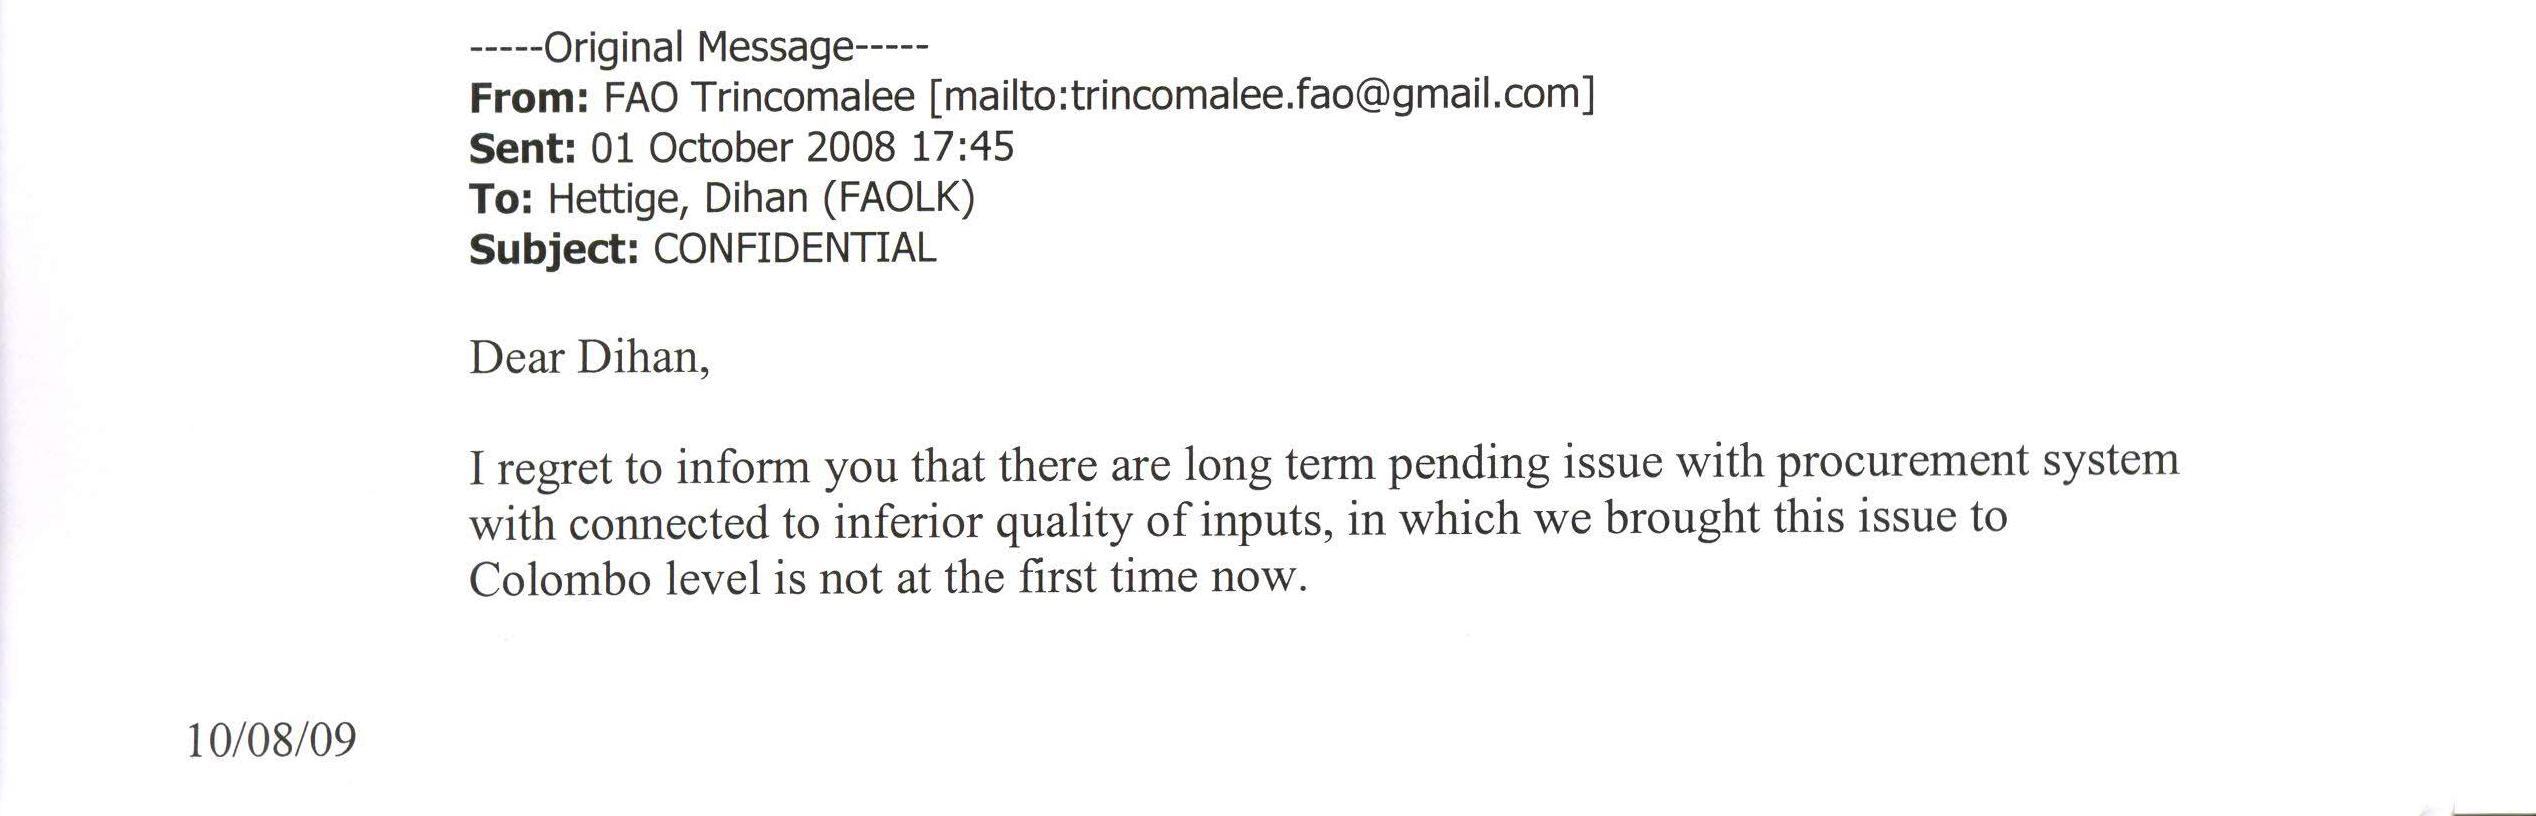 Letter form Trinco office 1st part